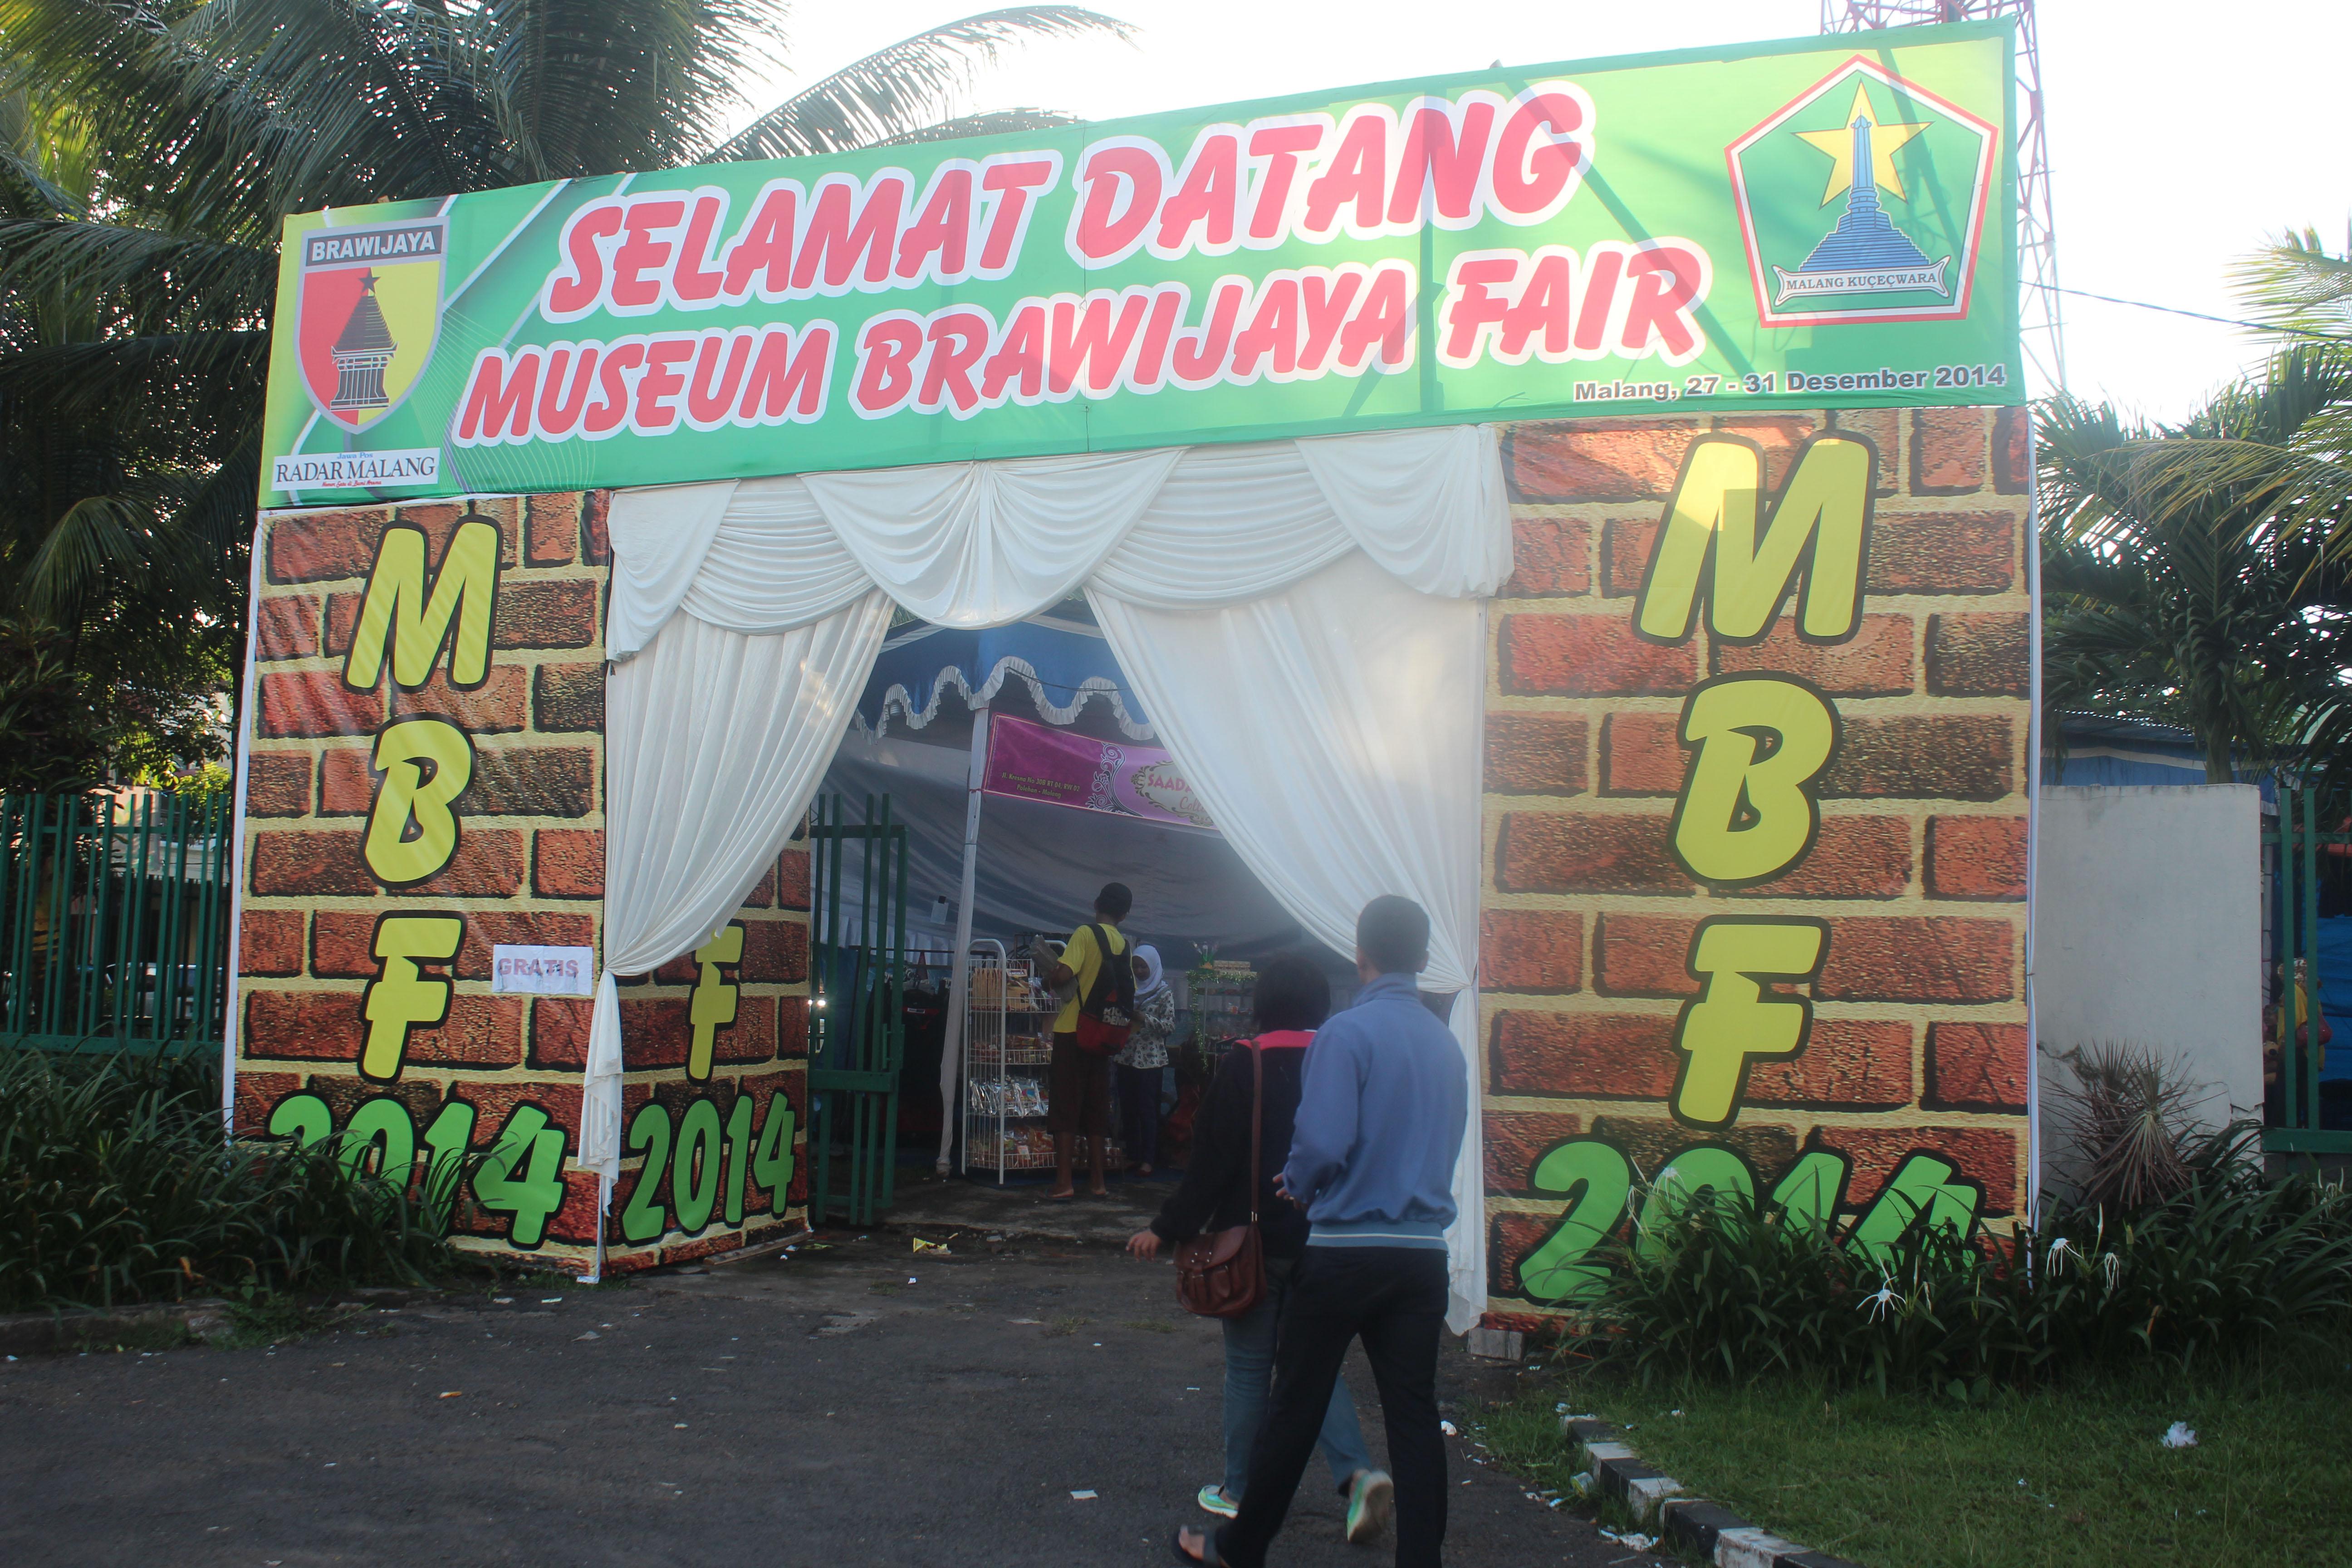 Acara Lirikmalang Img 8321 Museum Brawijaya Kab Malang